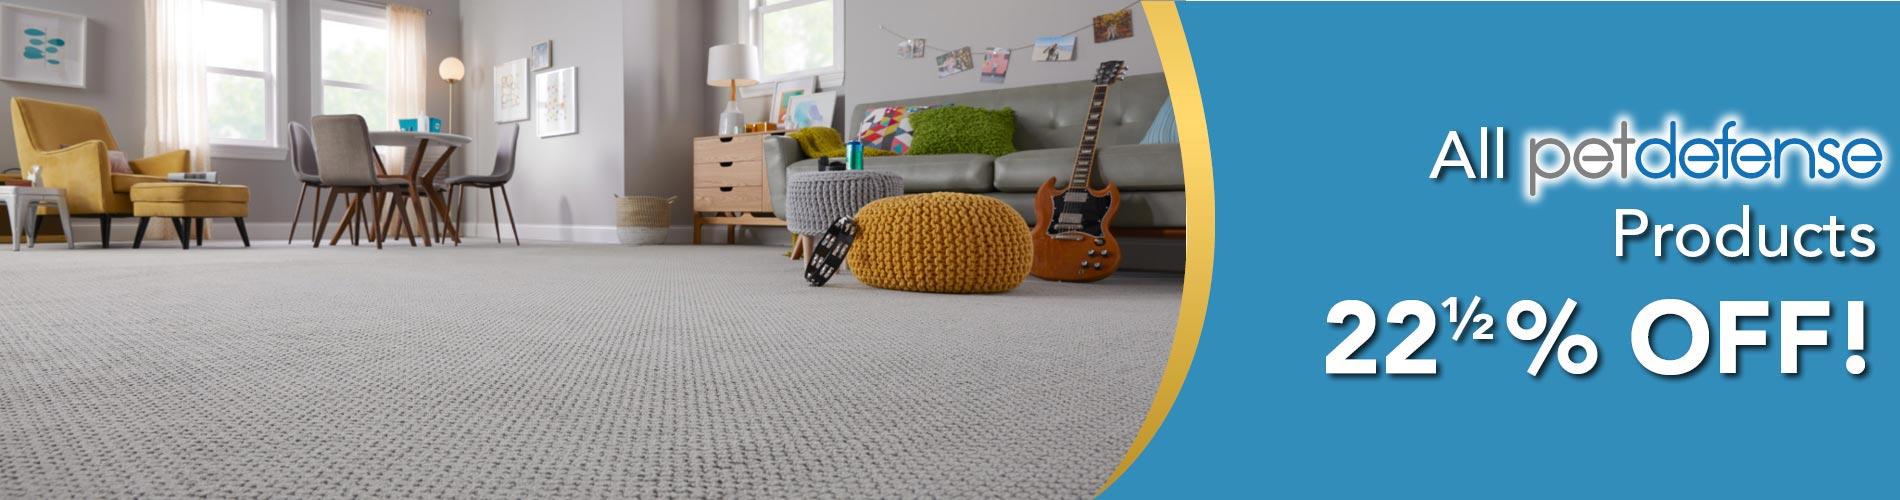 Pet-friendly carpet on sale at Oasis Floor & Design Center in Lake Havasu City